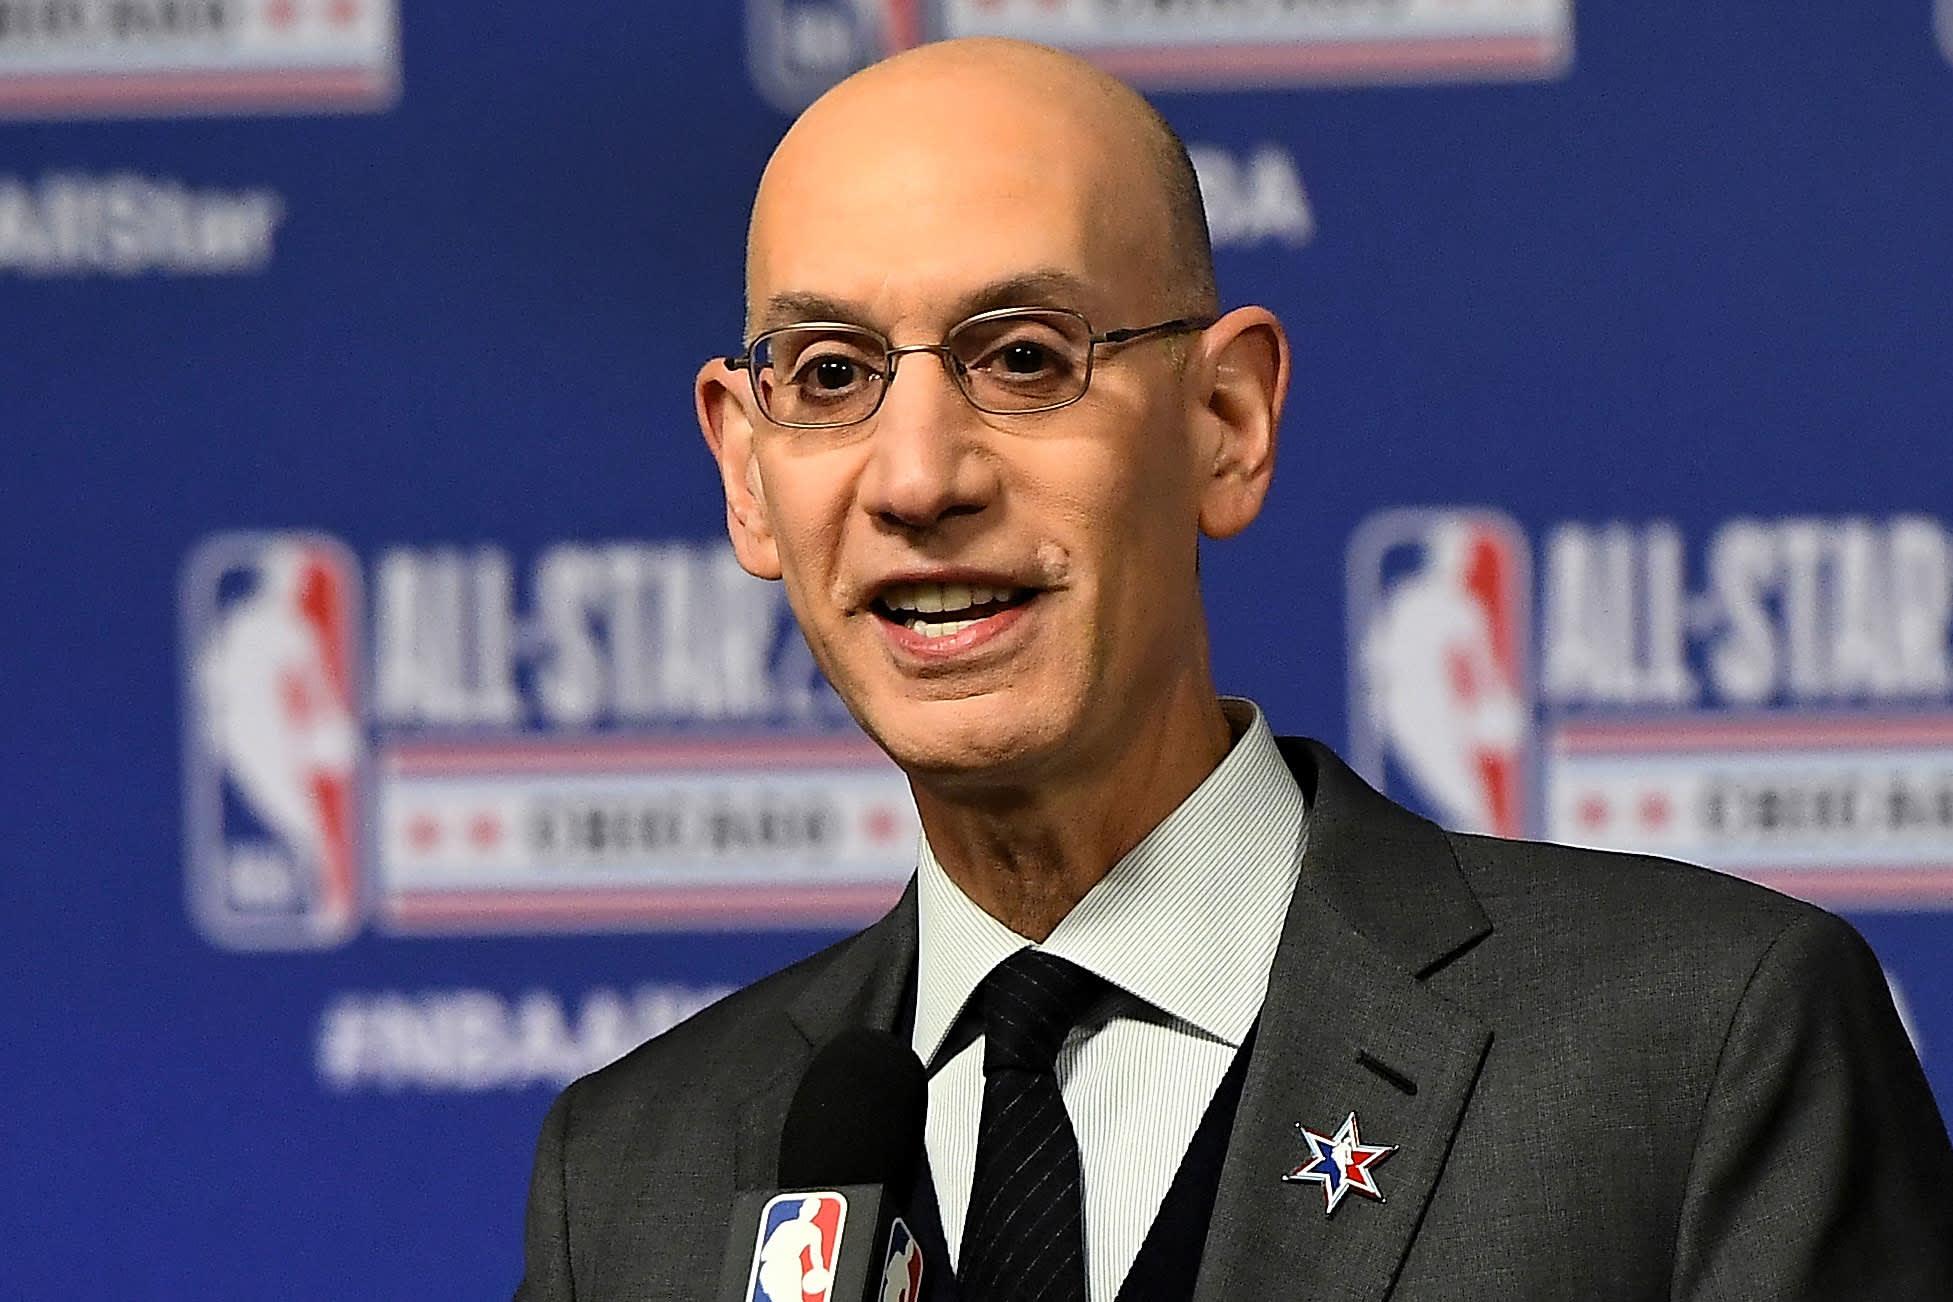 Coronavirus live updates: NBA reaches agreement on reducing player compensation, global deaths cross 150,000